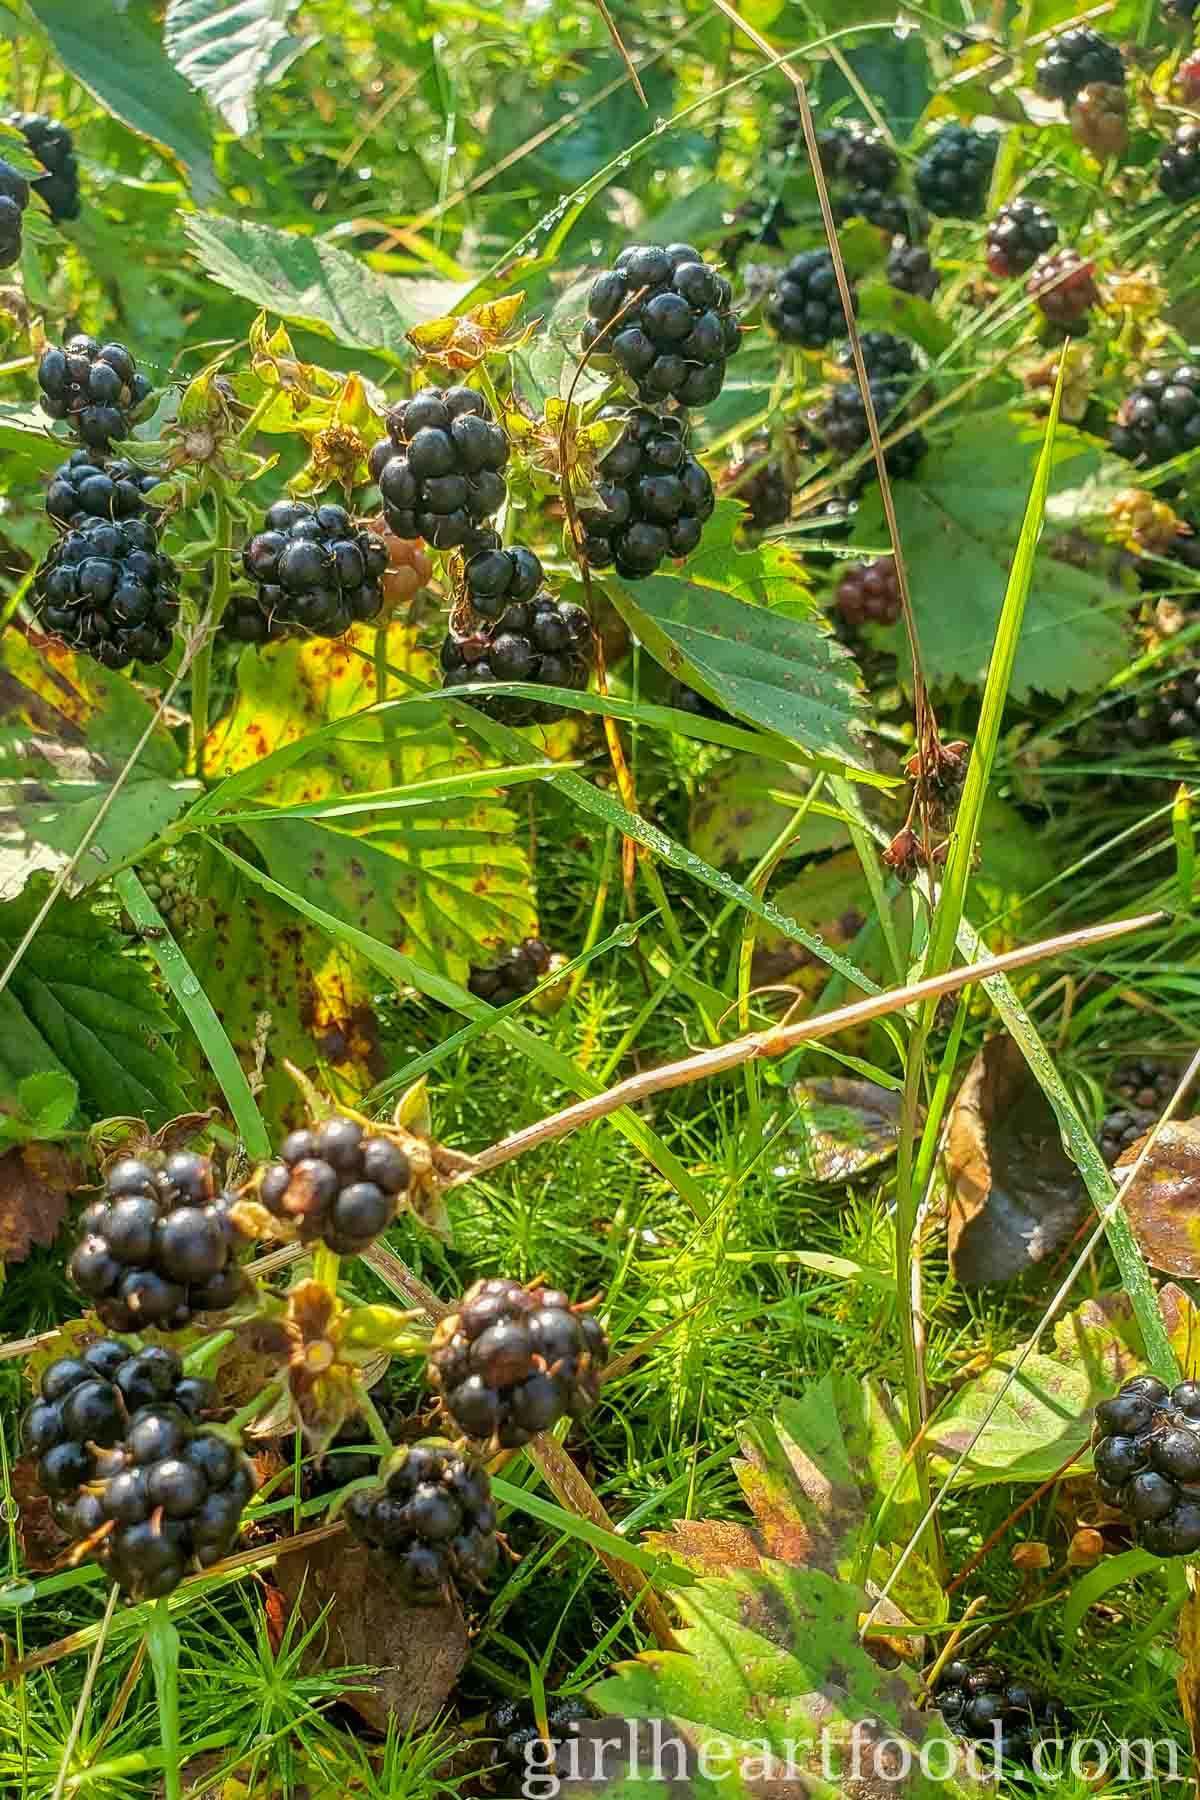 Wild blackberries on a bush.